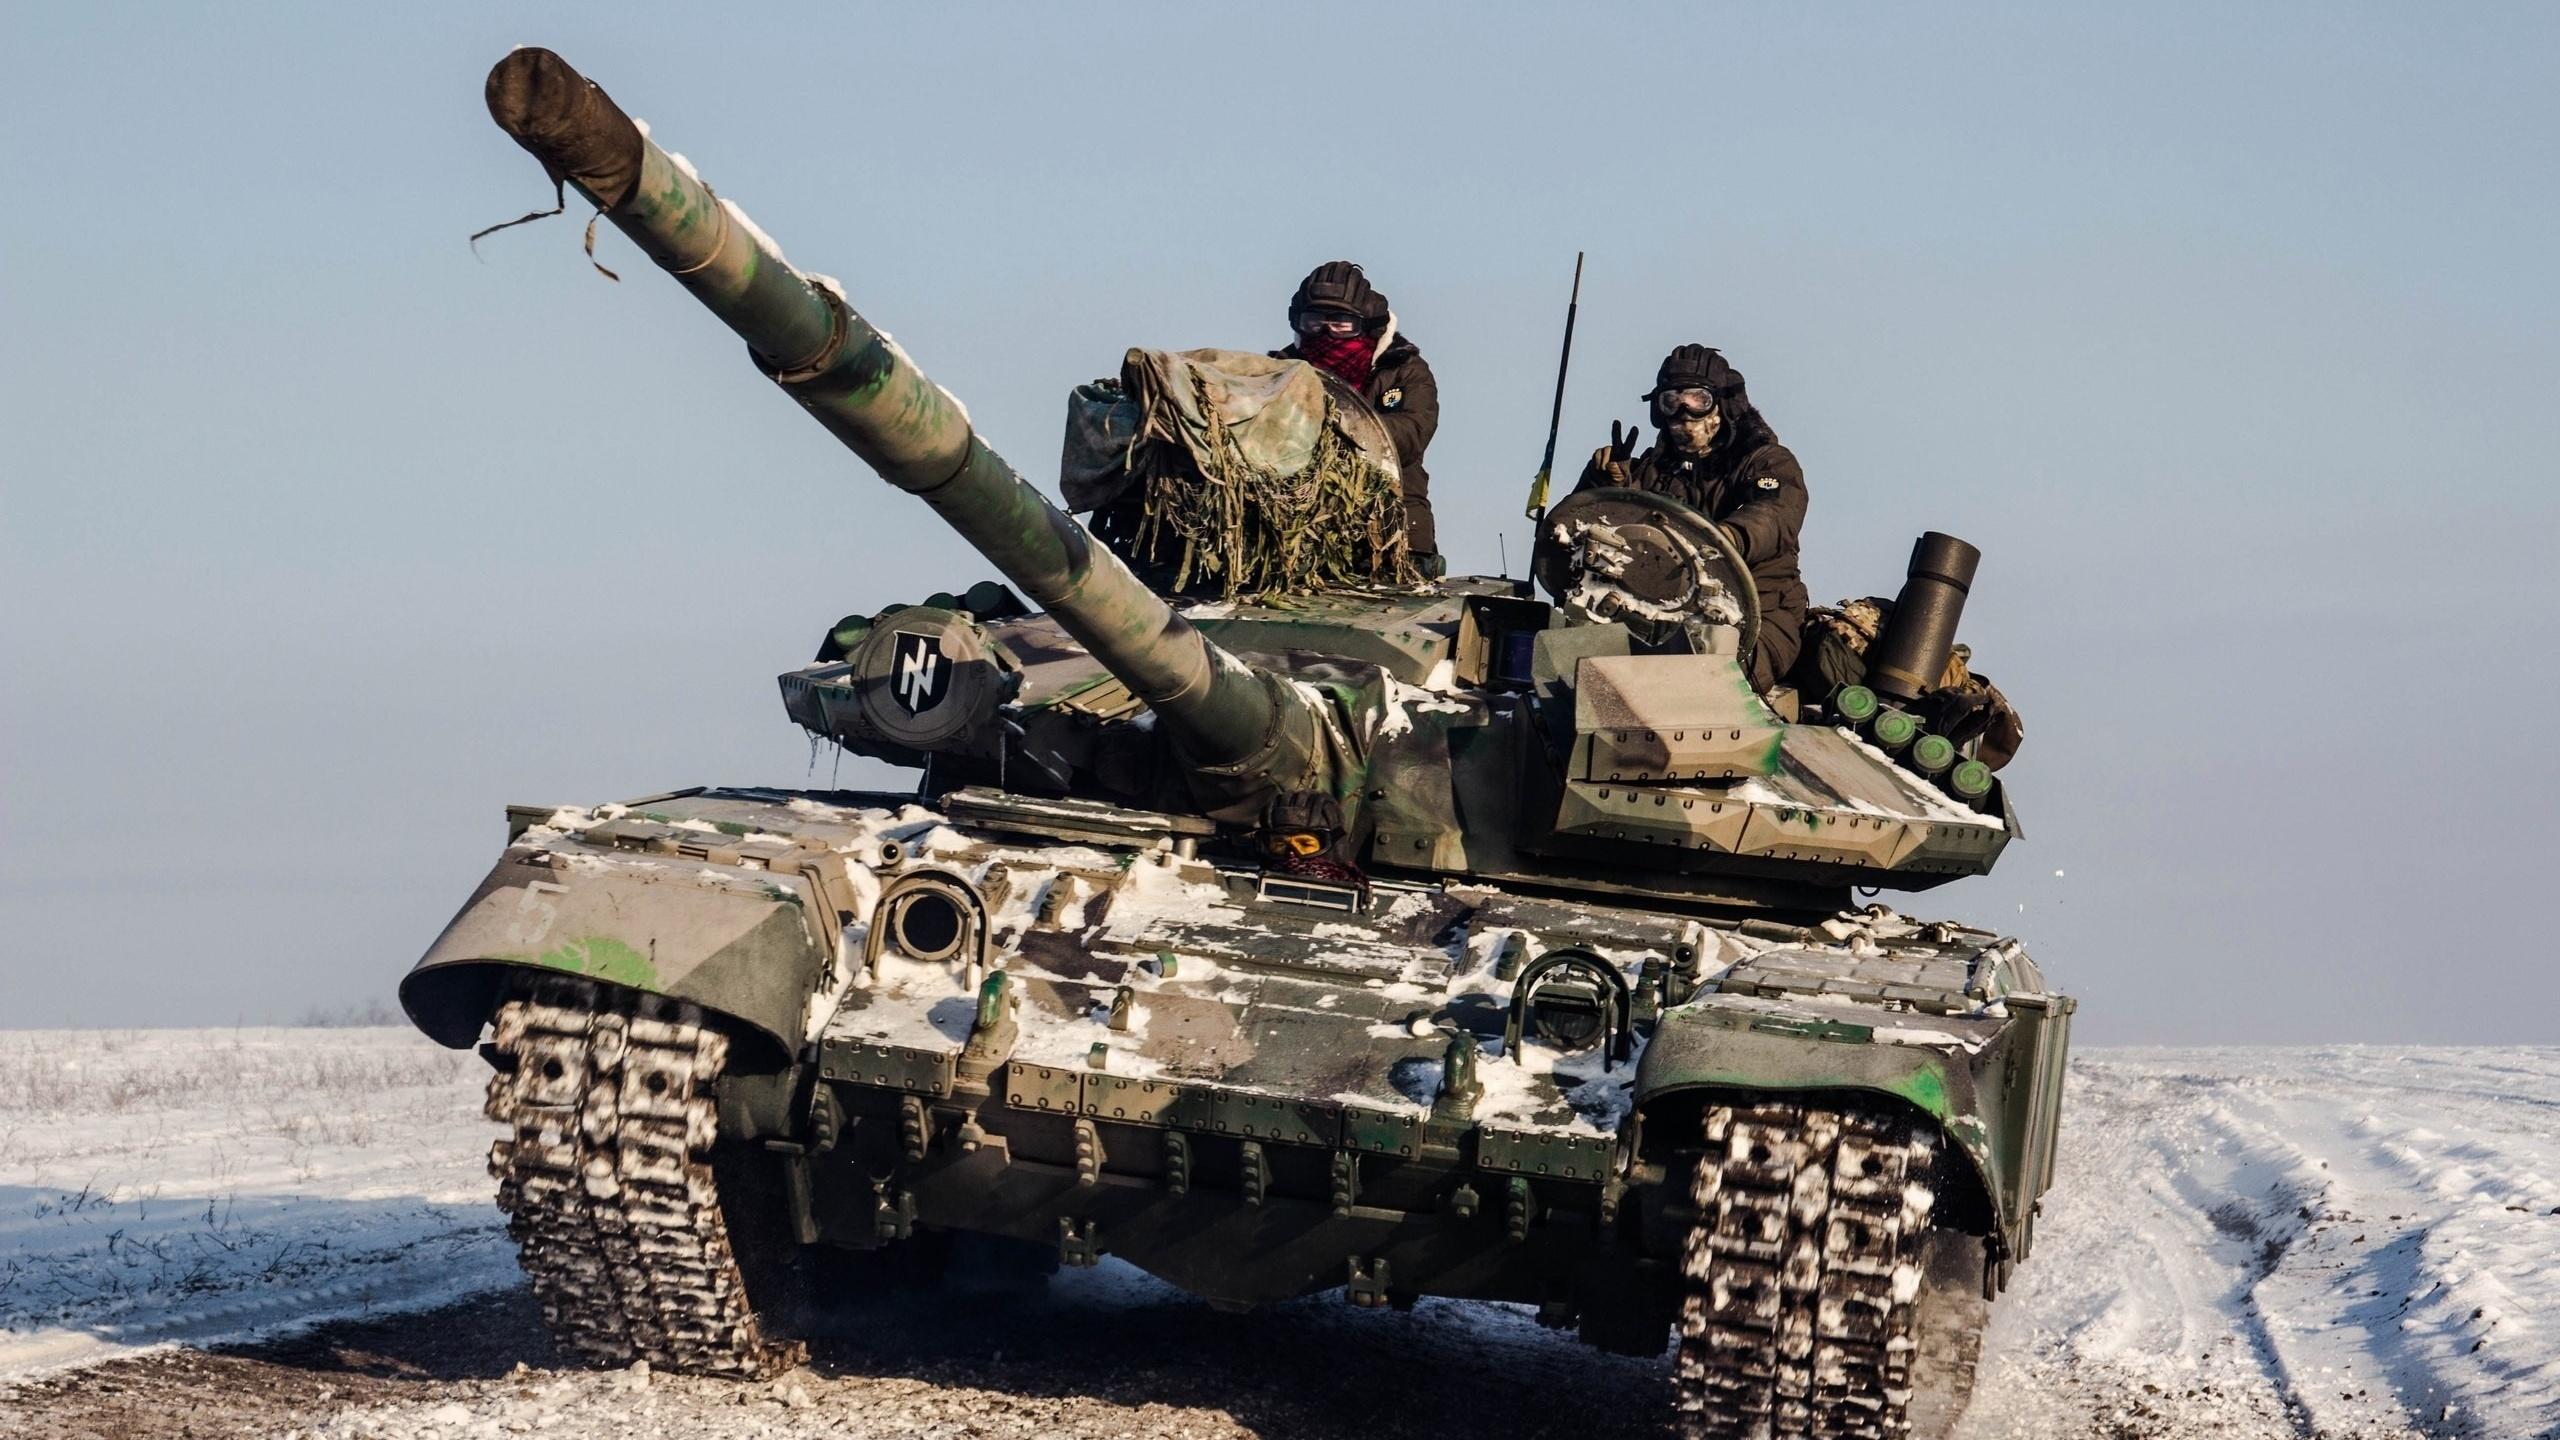 танк, т-64б1м, броня, защита, солдаты, україна, воины, патриоты